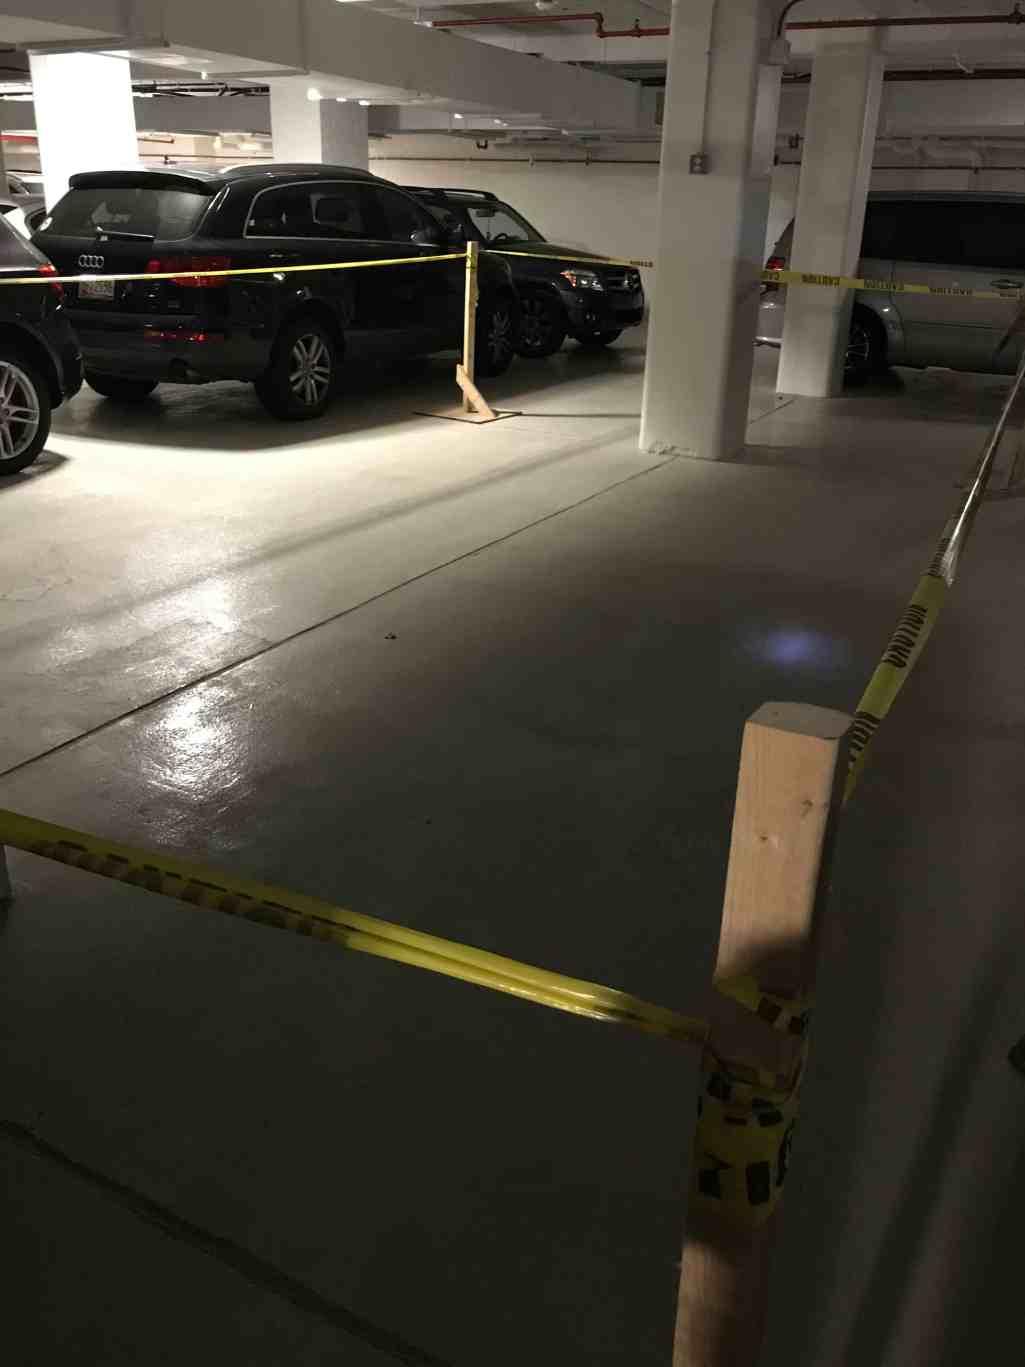 Lafayette Building – Parking Garage Repairs